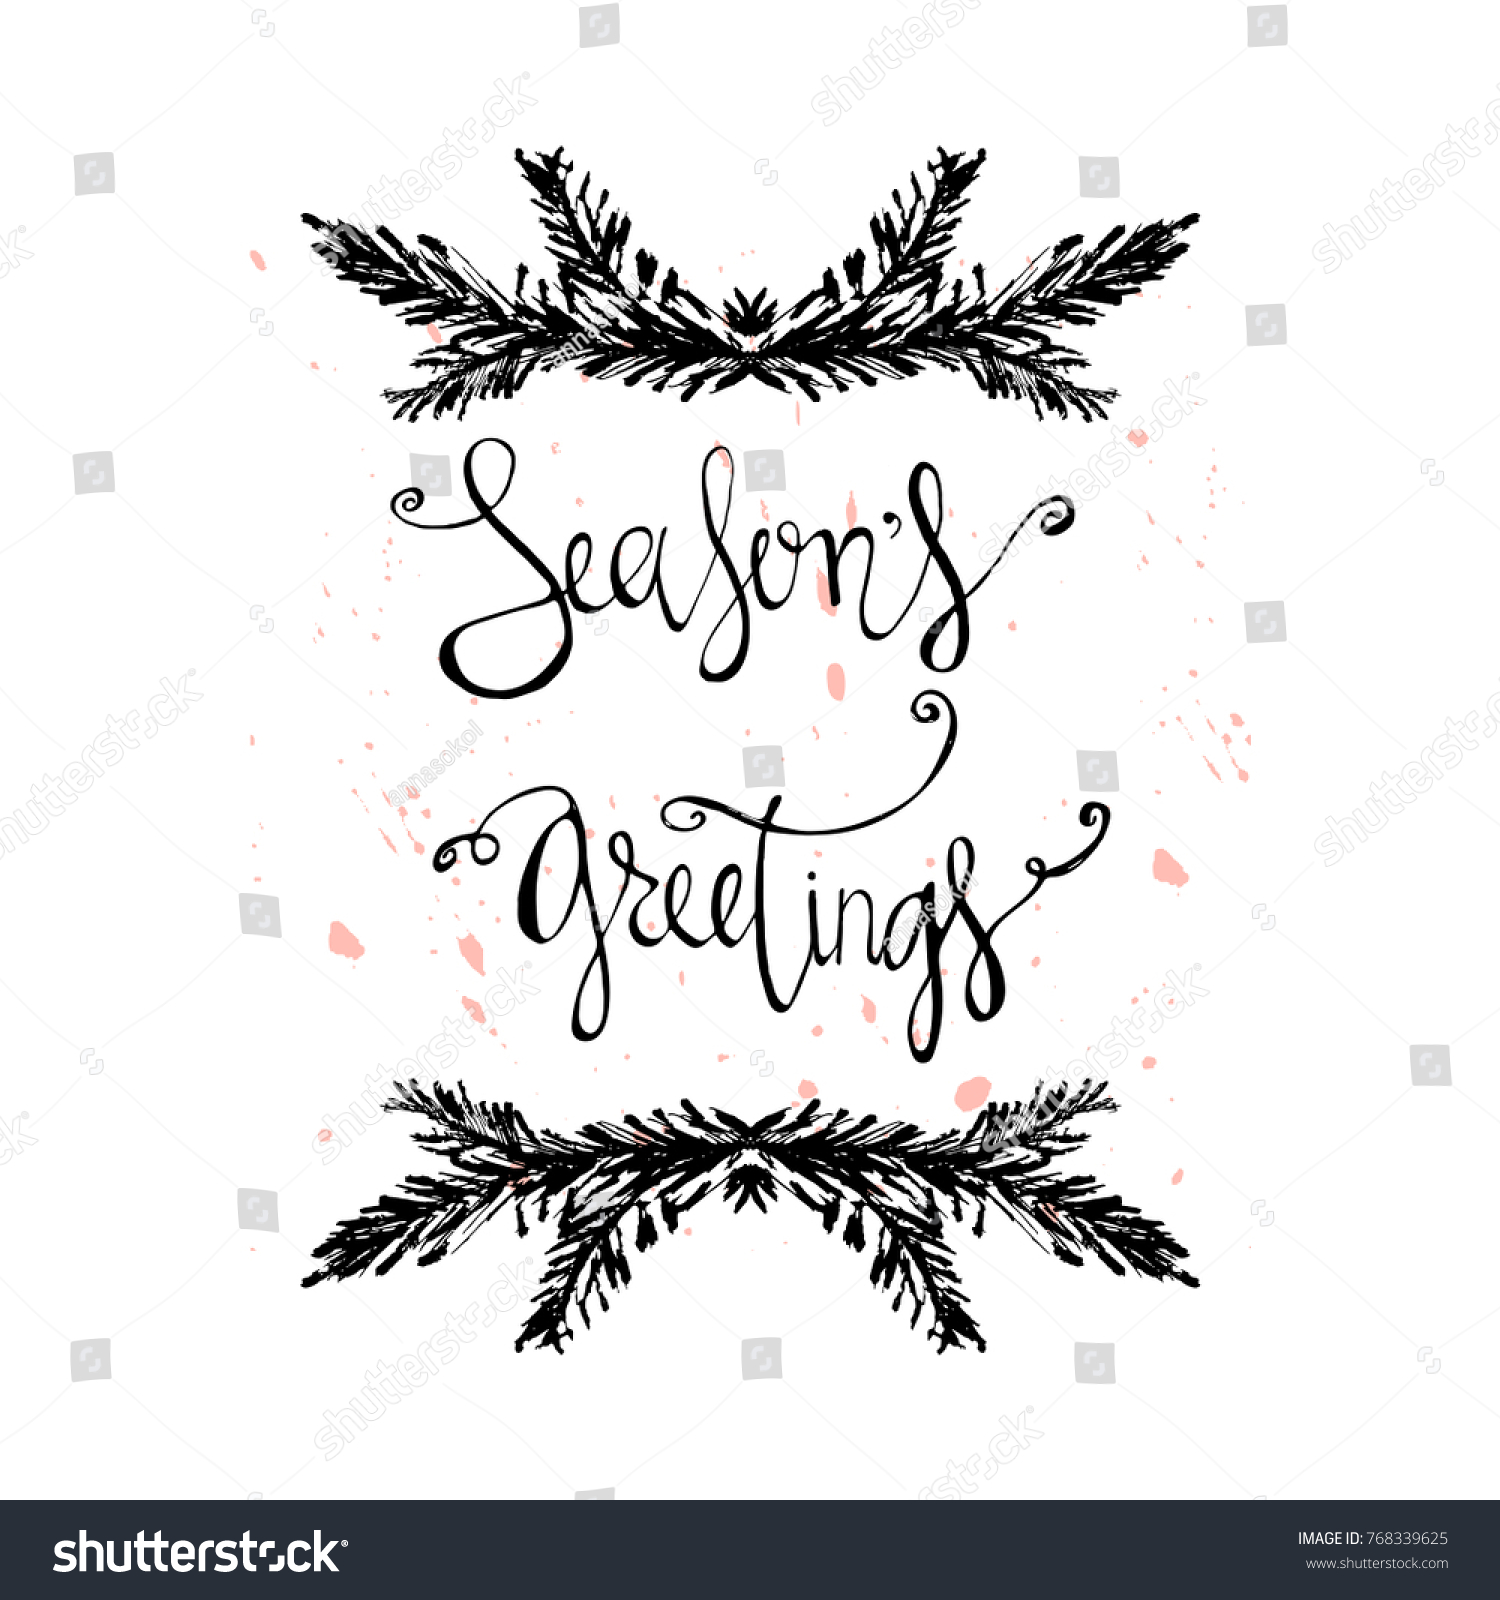 Seasons greetings xmas hand drawn christmas stock vector 768339625 seasons greetings xmas hand drawn christmas tree branch and lettering card design cute xmas holiday kristyandbryce Choice Image